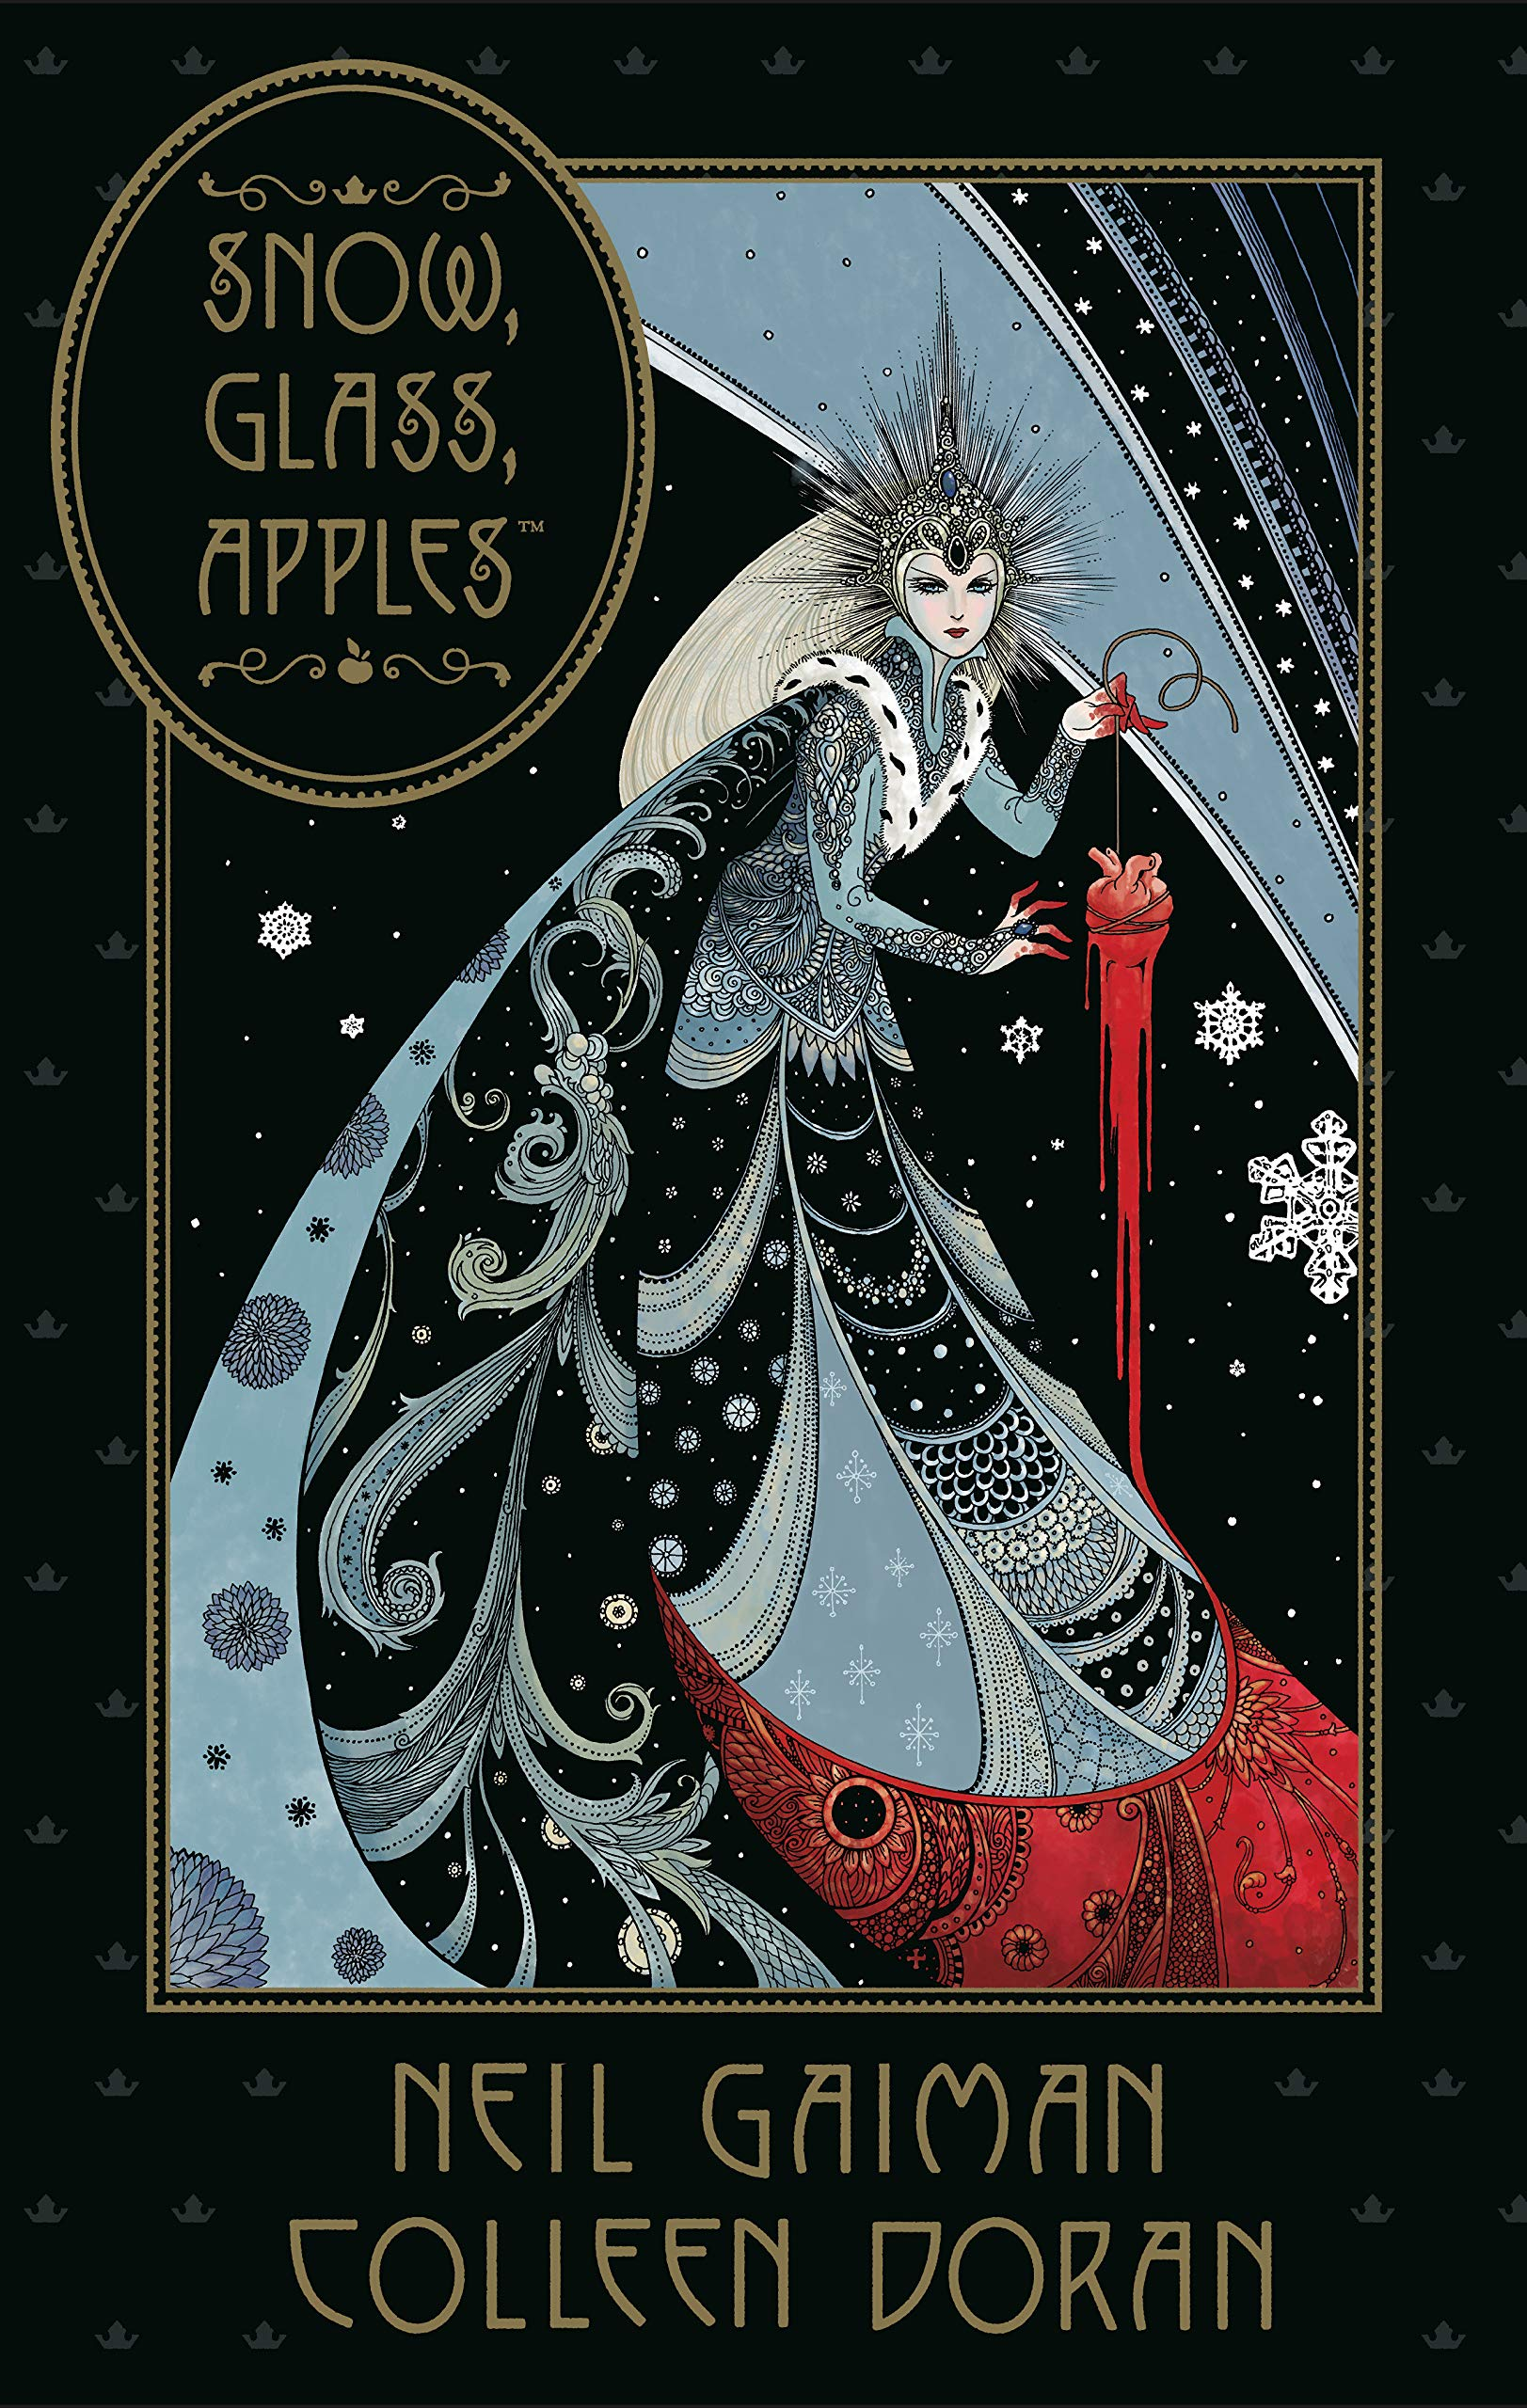 Snow, Glass, Apples - Neil Gaiman e Colleen Doran